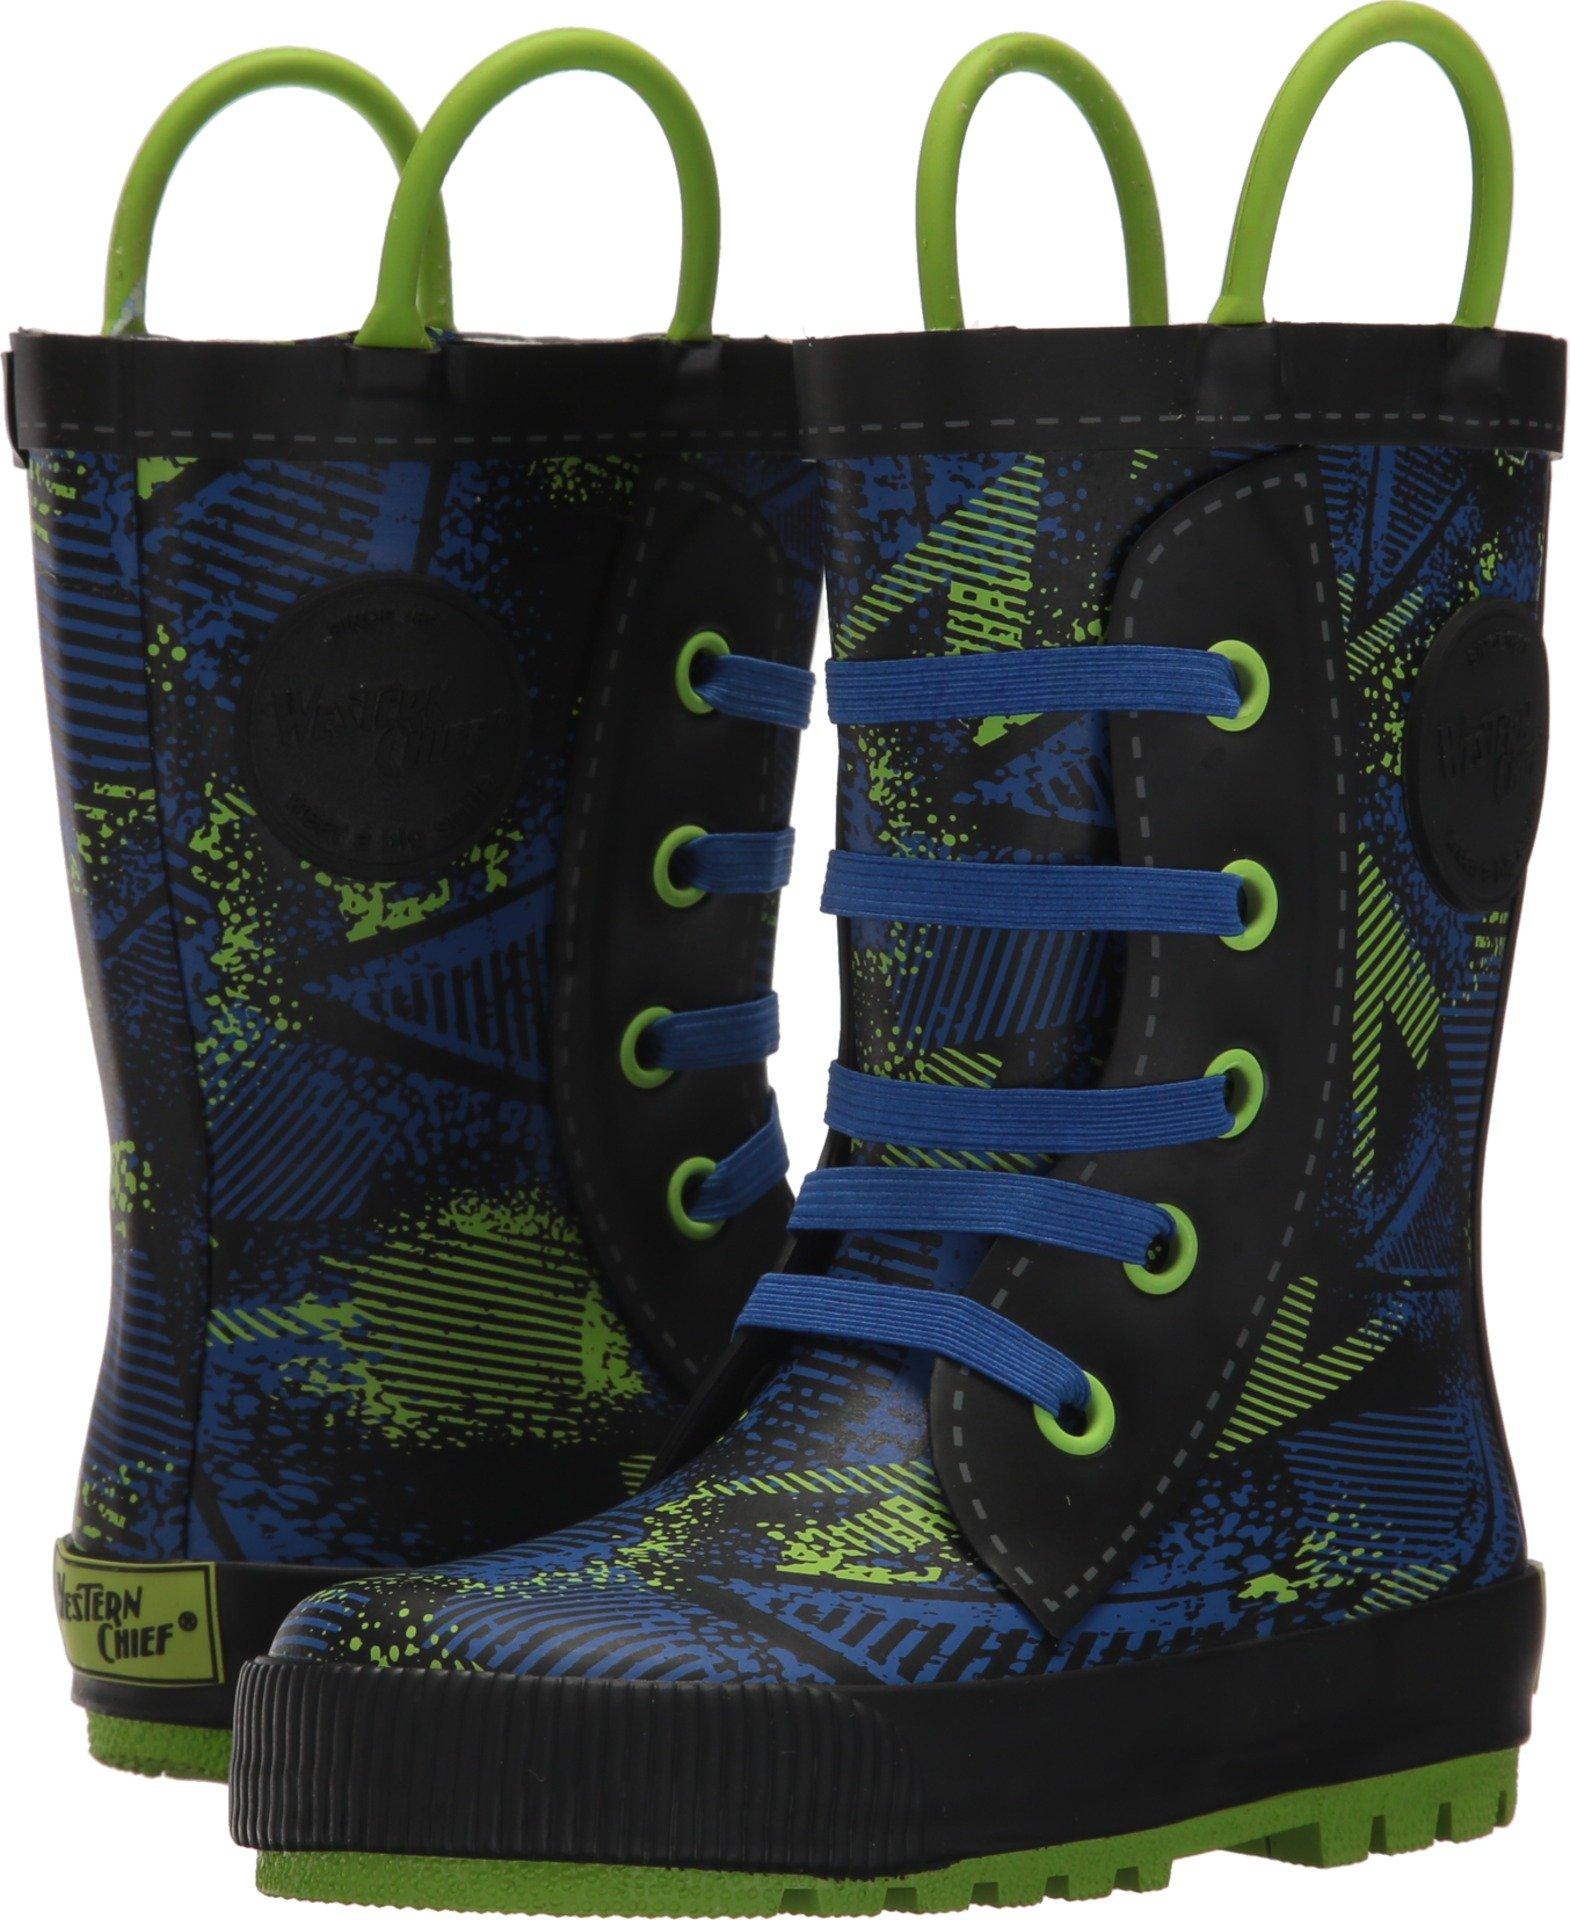 Western Chief Kids Ollie Sneaker Boot Royal Blue 12